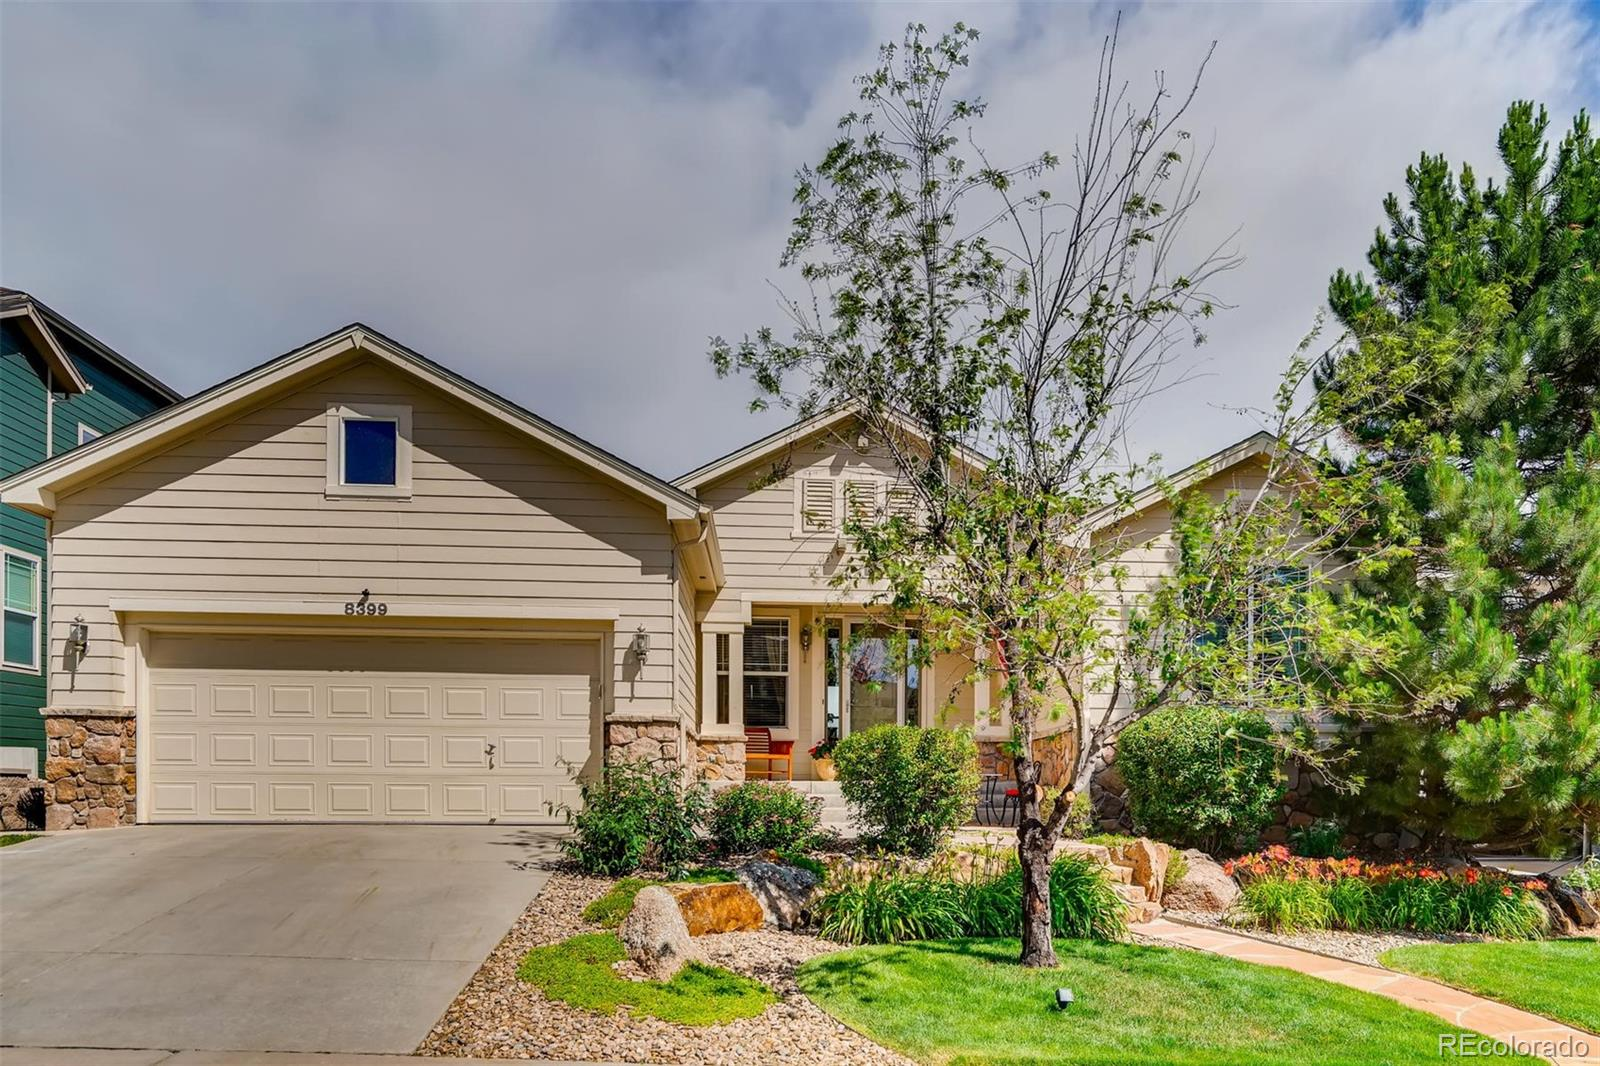 MLS# 8392036 - 1 - 8399 Winter Berry Drive, Castle Pines, CO 80108